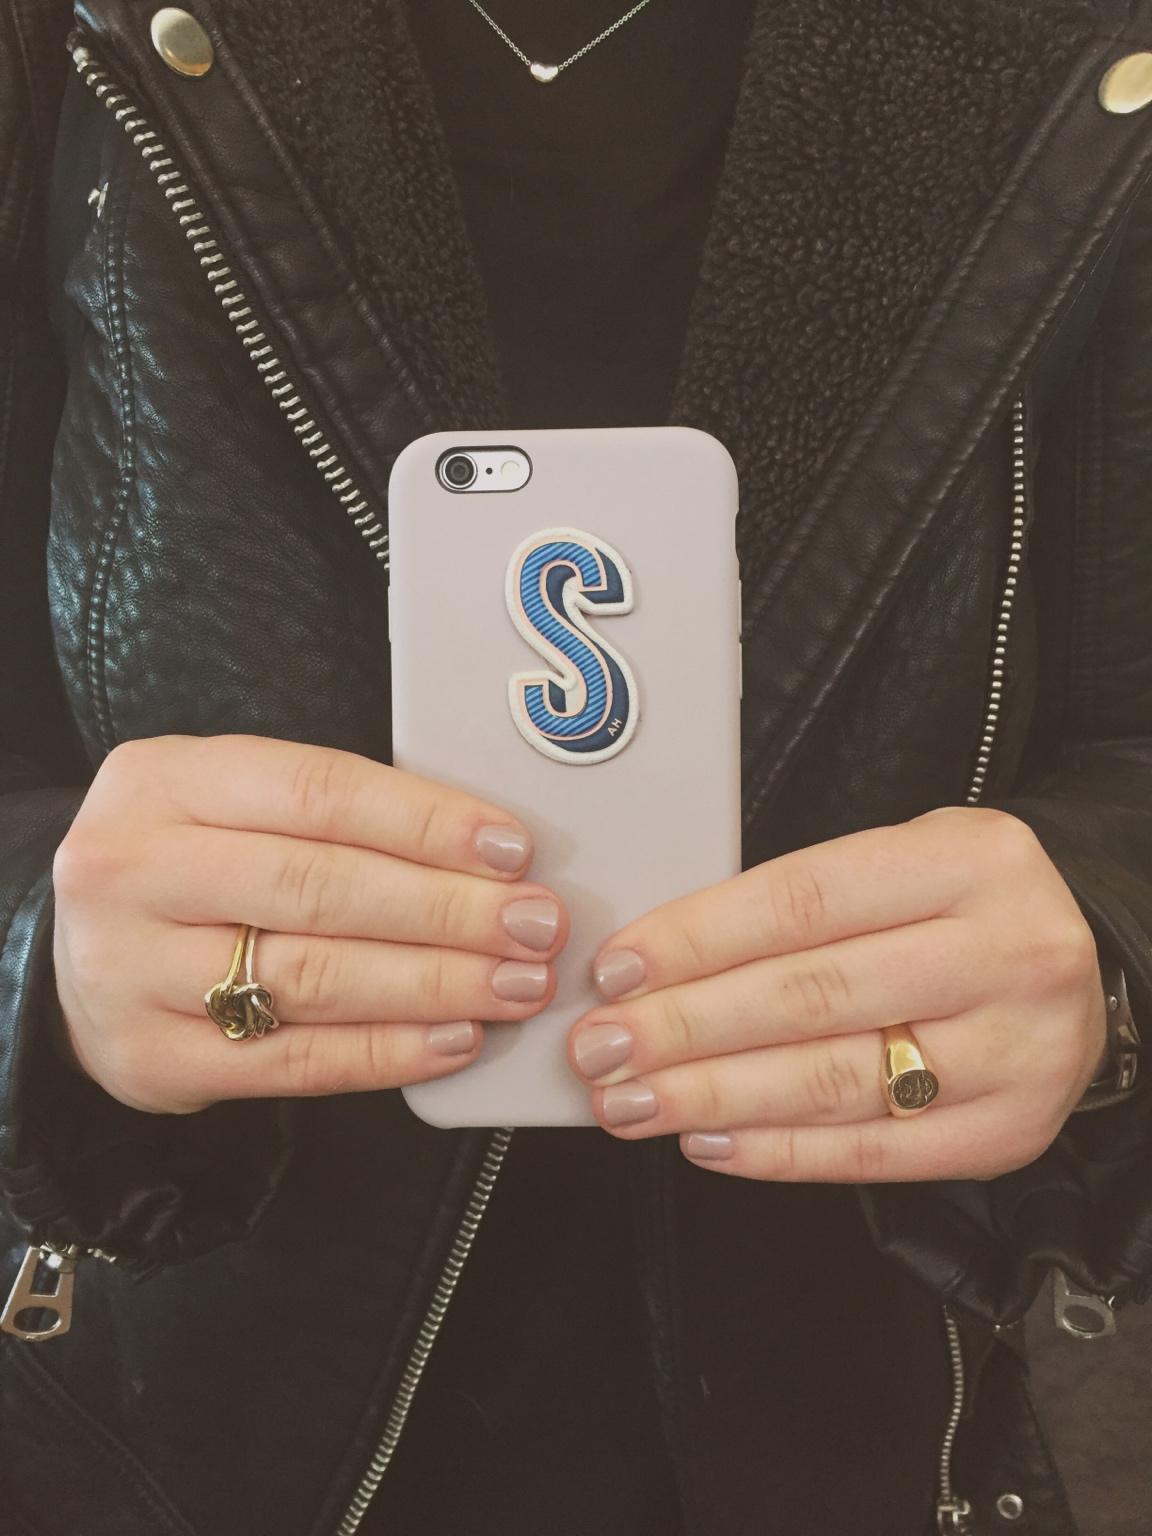 Apple Silicone Case + Anya Hindmarch Sticker